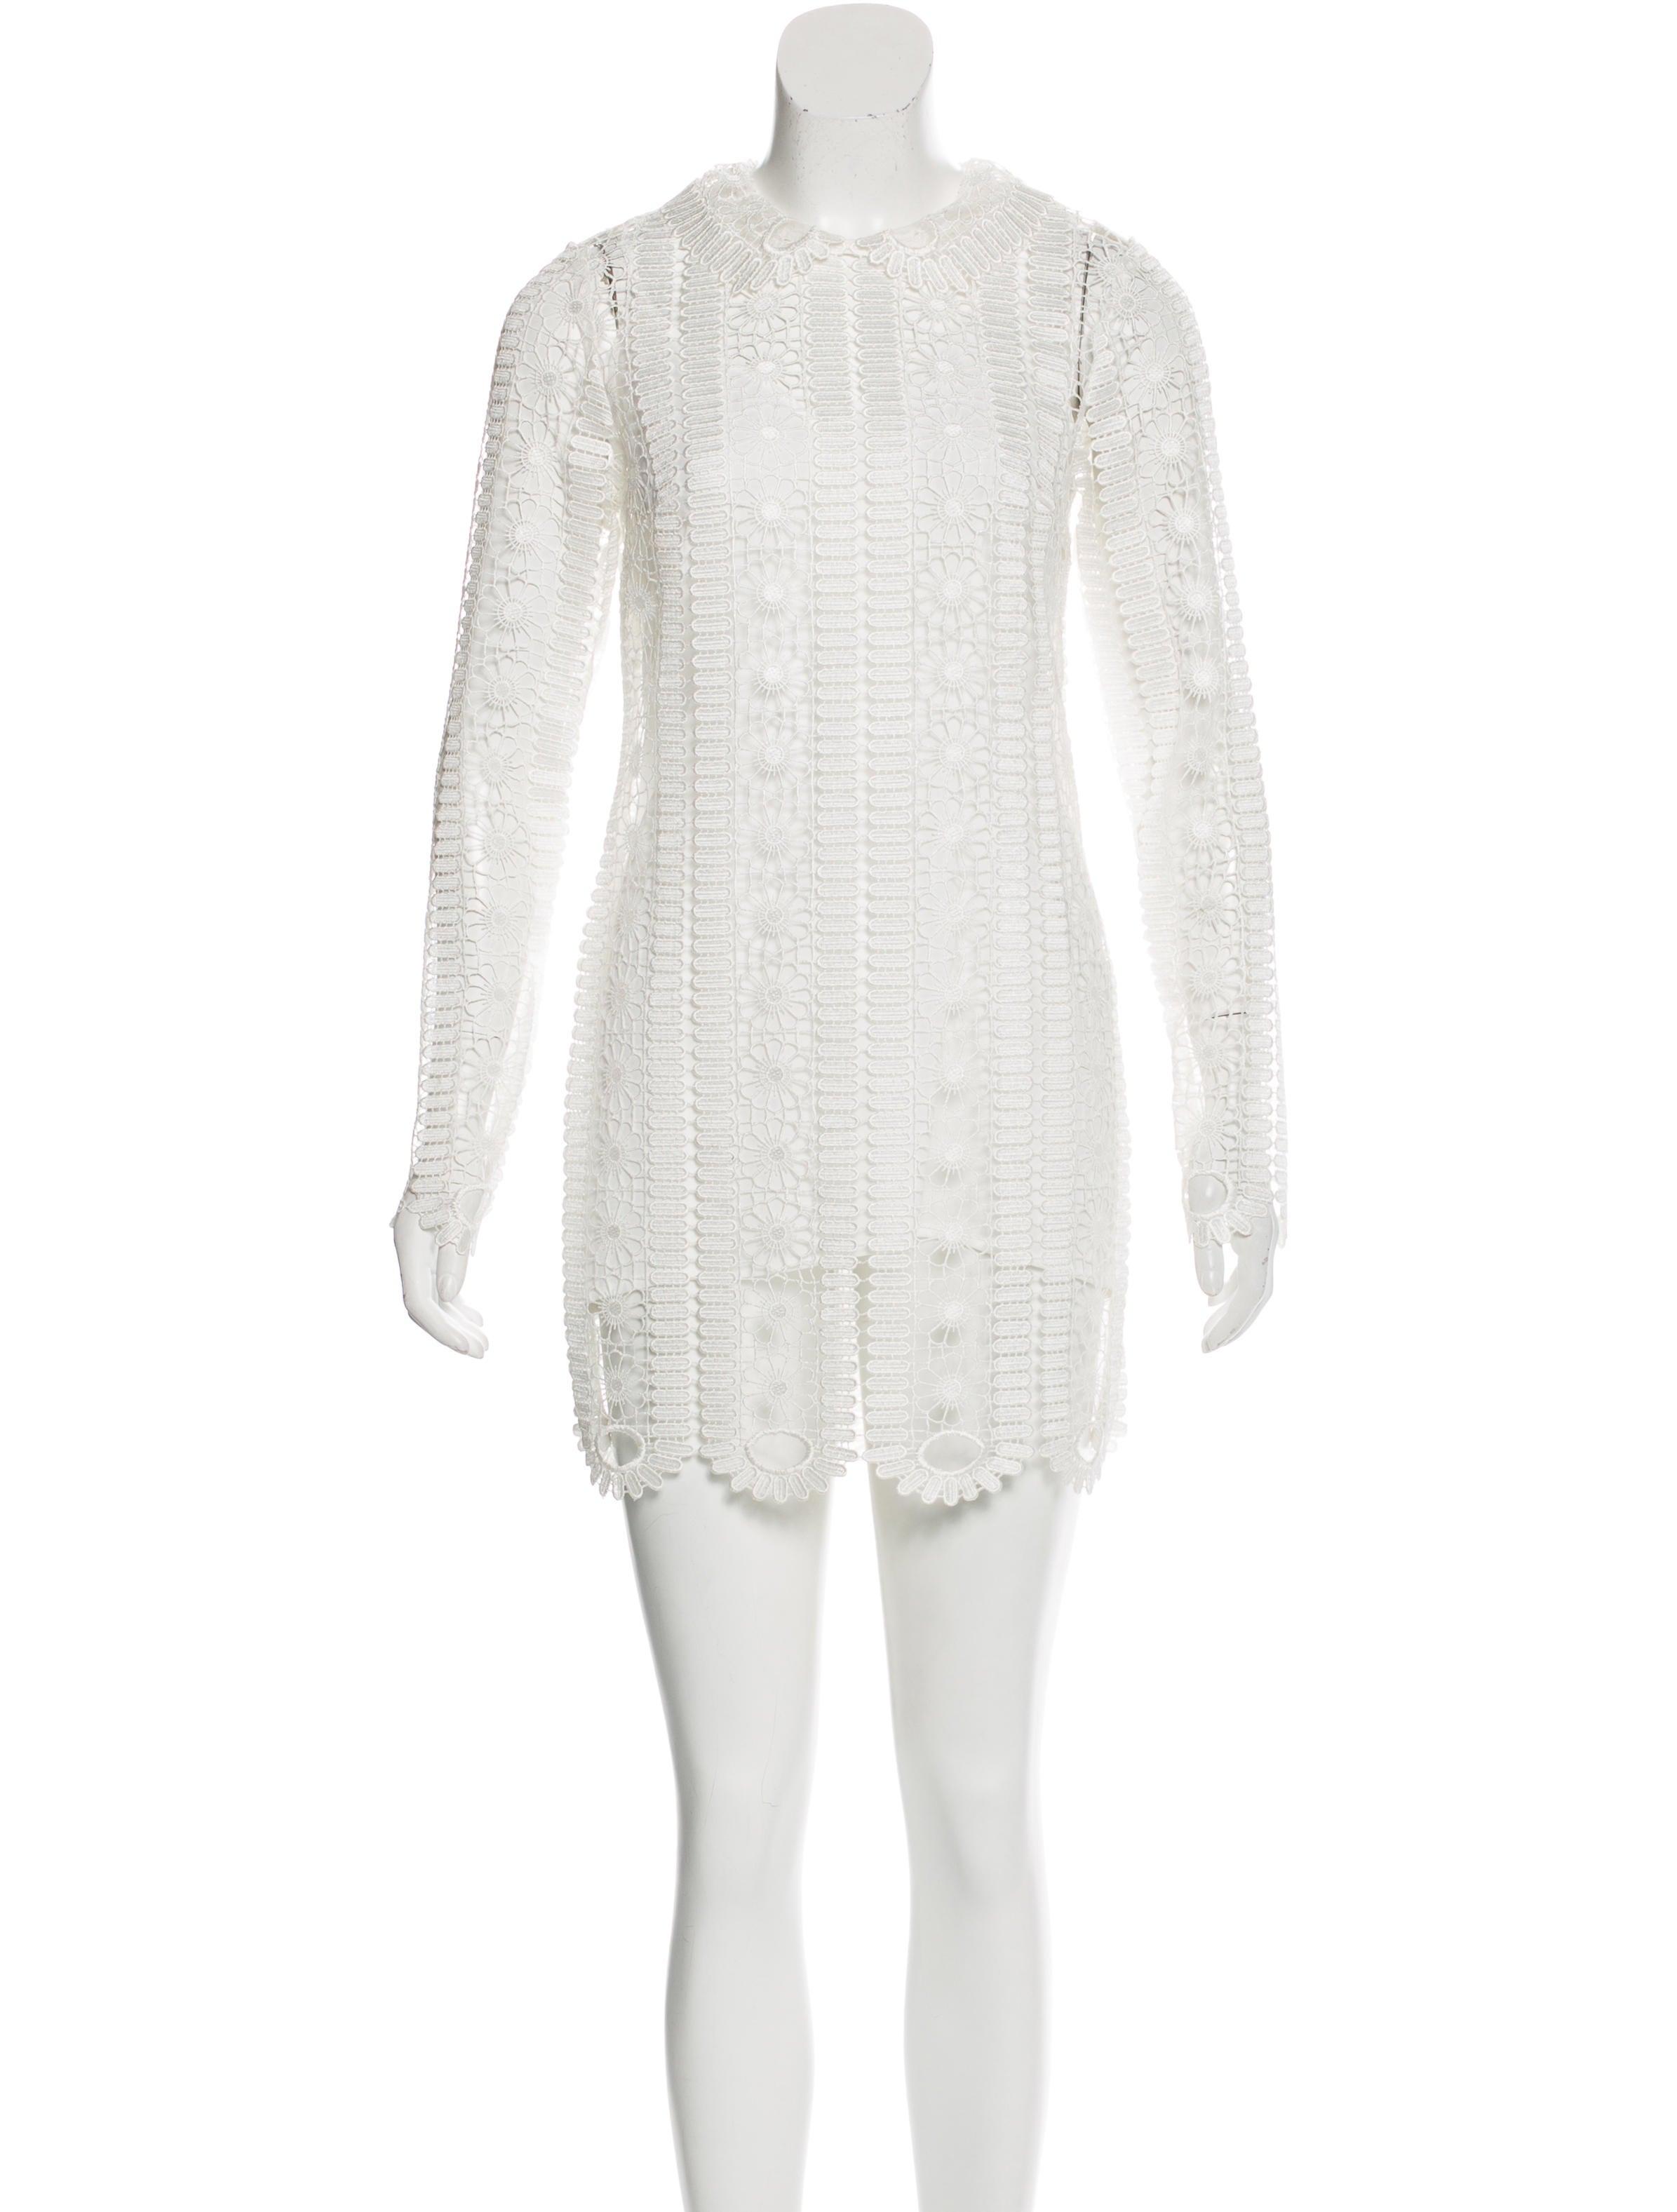 068e775749c Alice McCall Soho Lace Dress - Clothing - WMCCL20381